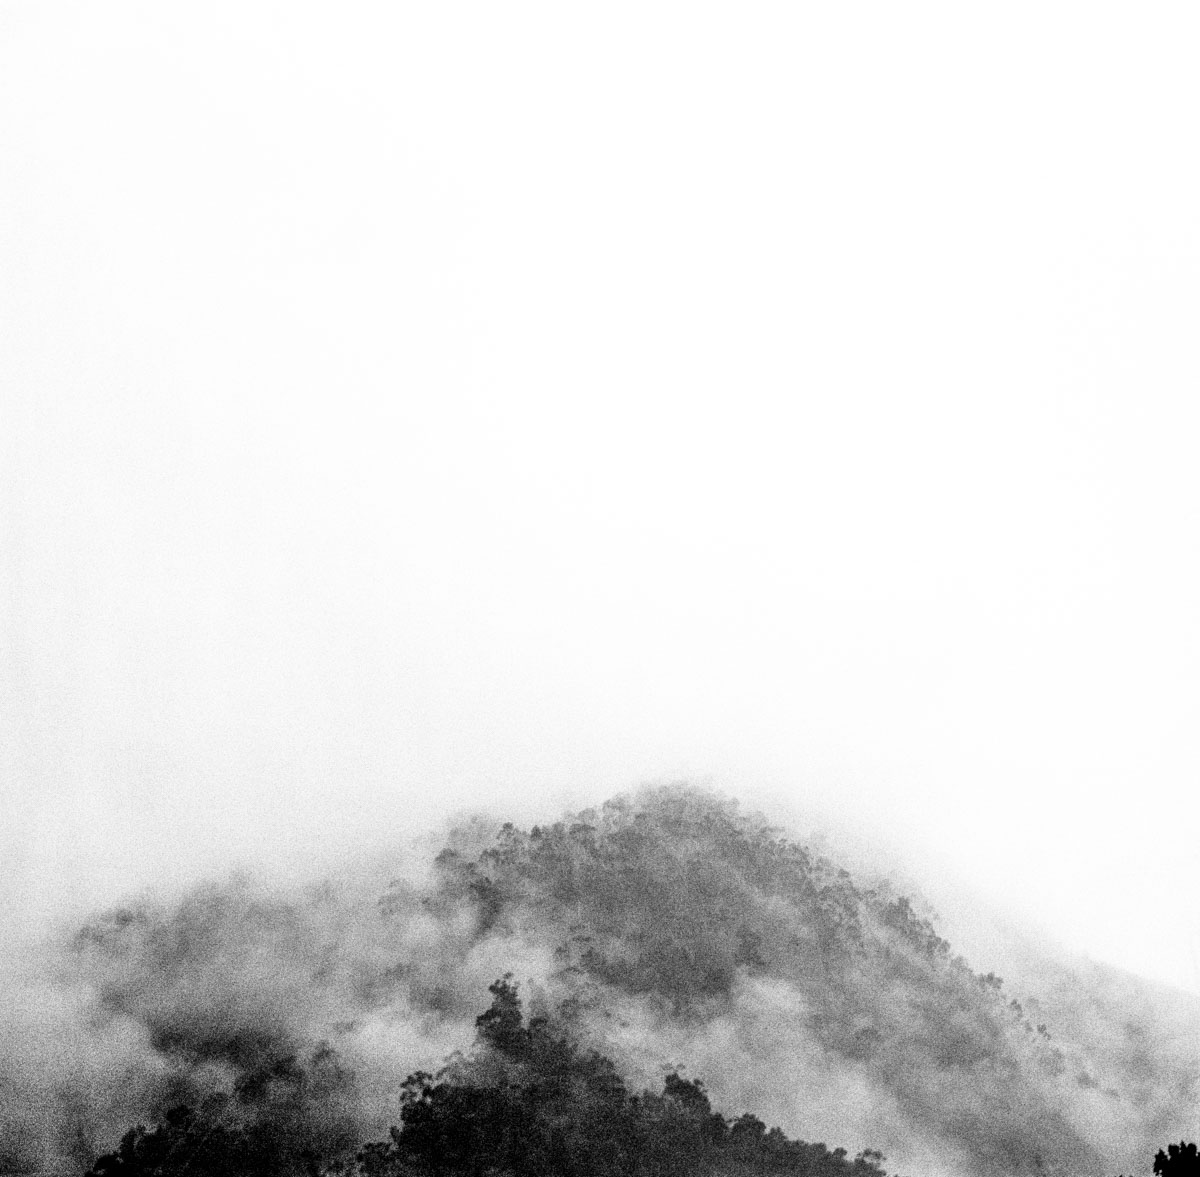 Gloomy_Bogota_22